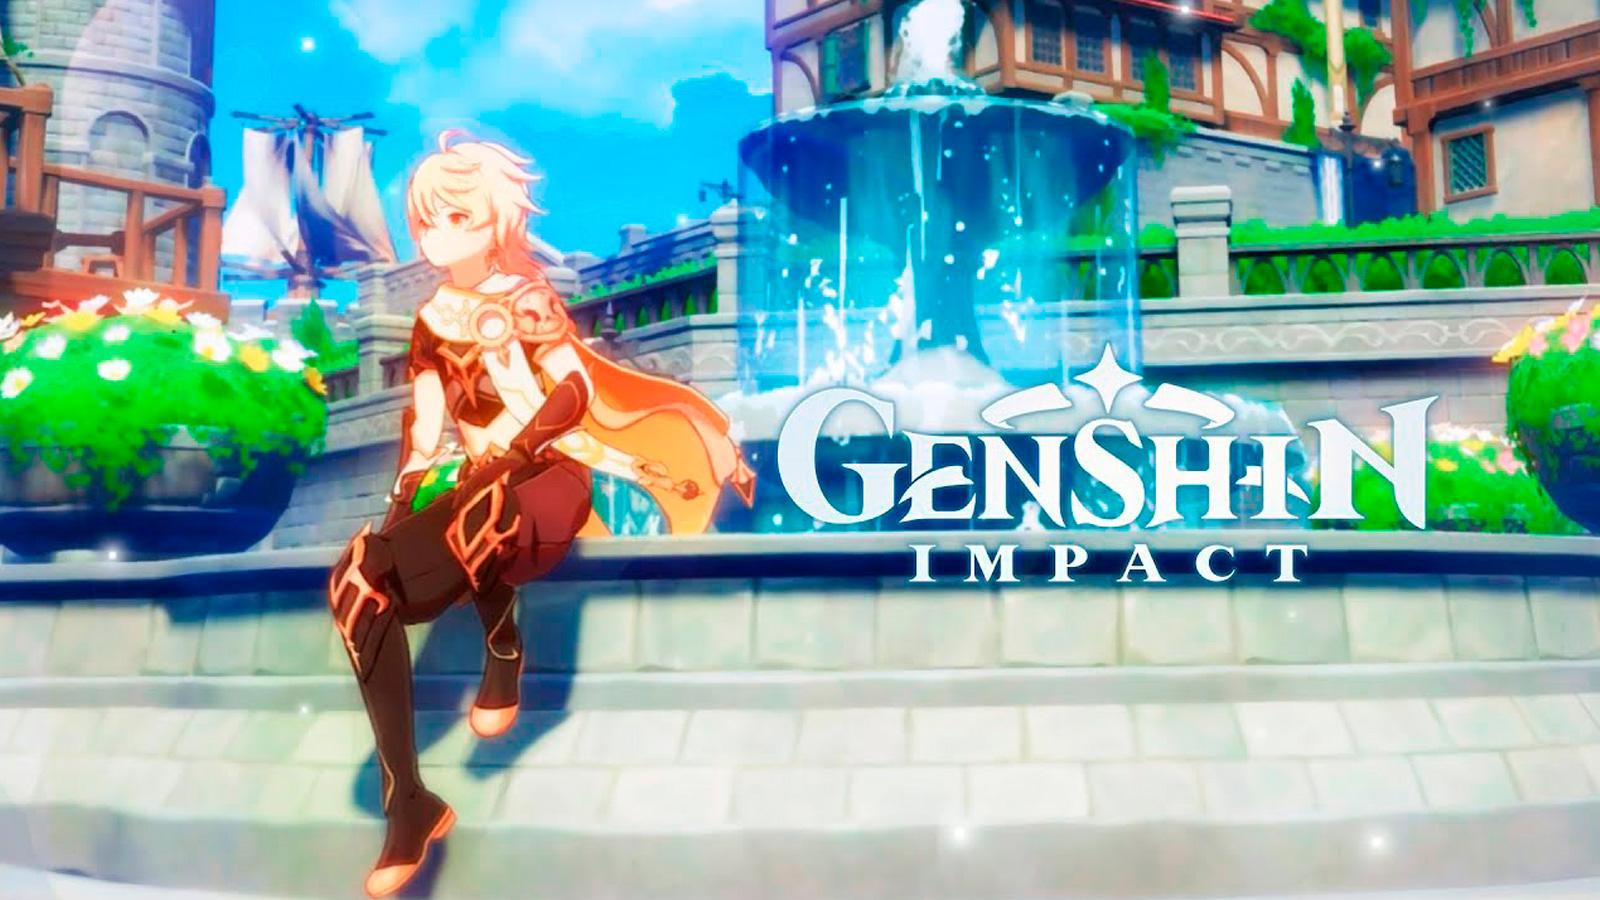 Personaje Genshin Impact